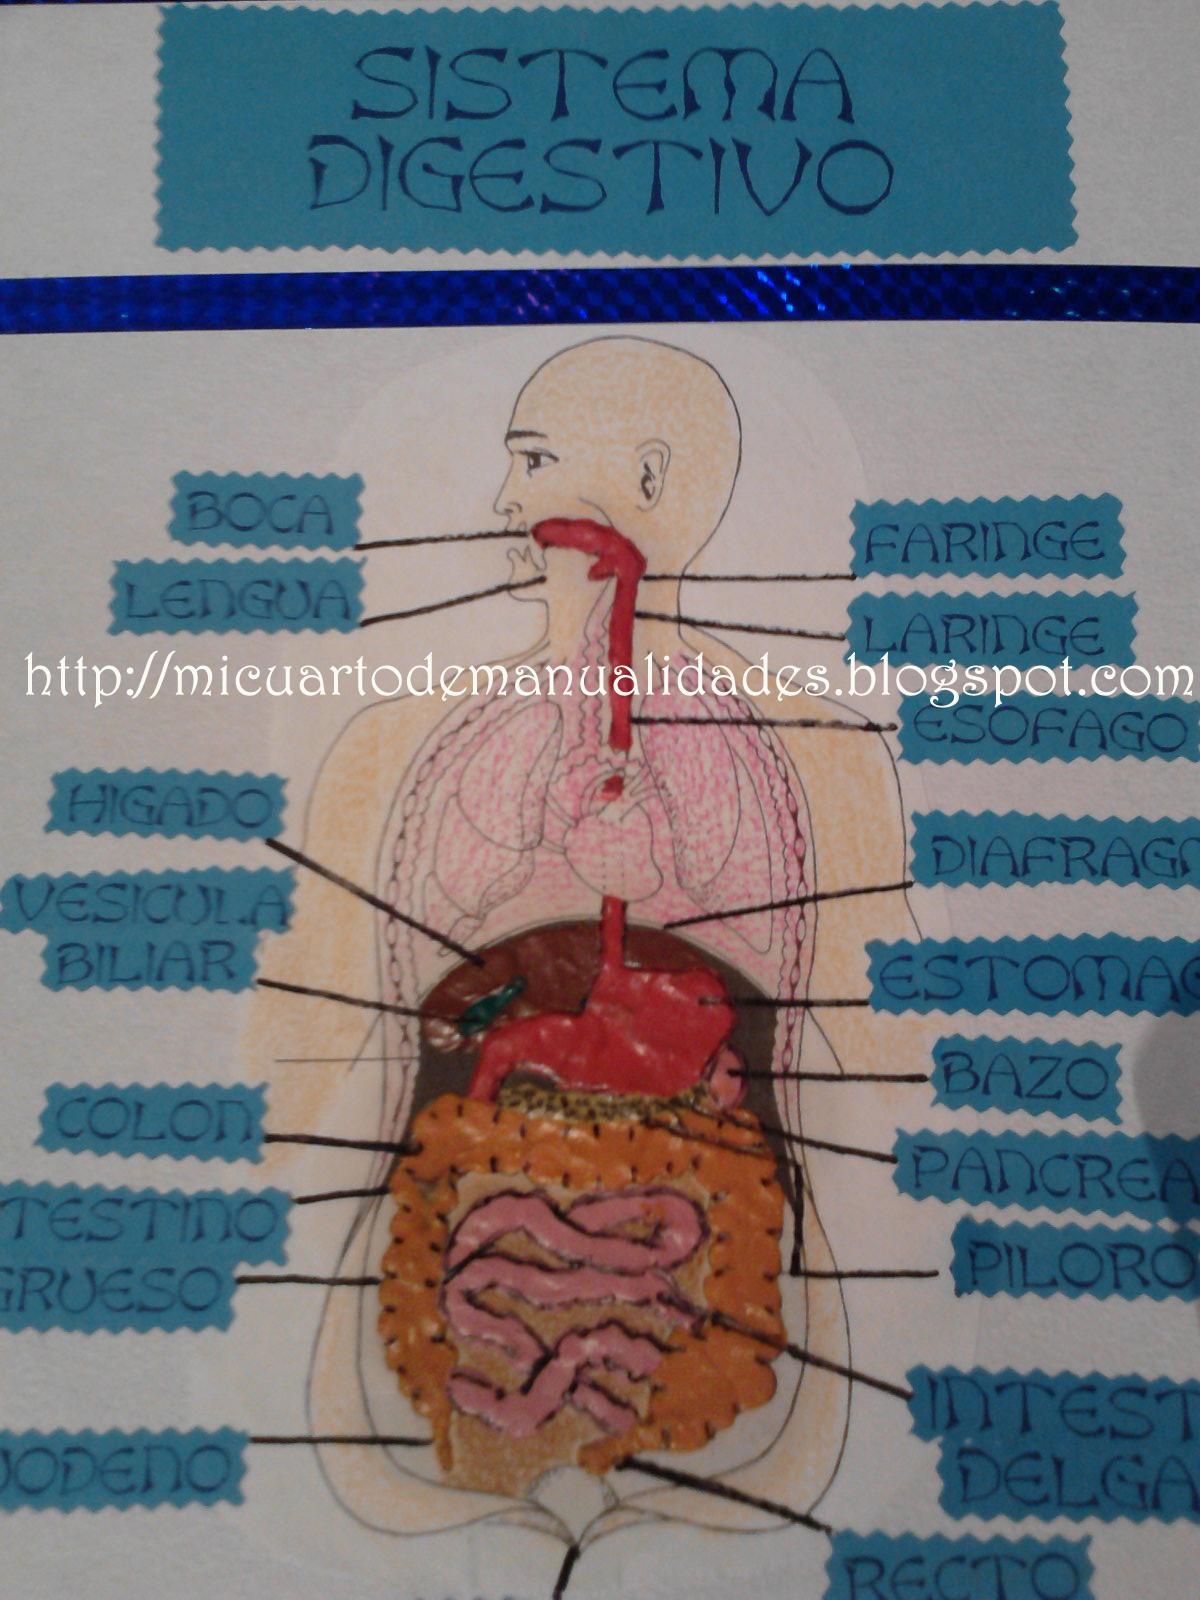 Imagenes Del Sistema Digestivo